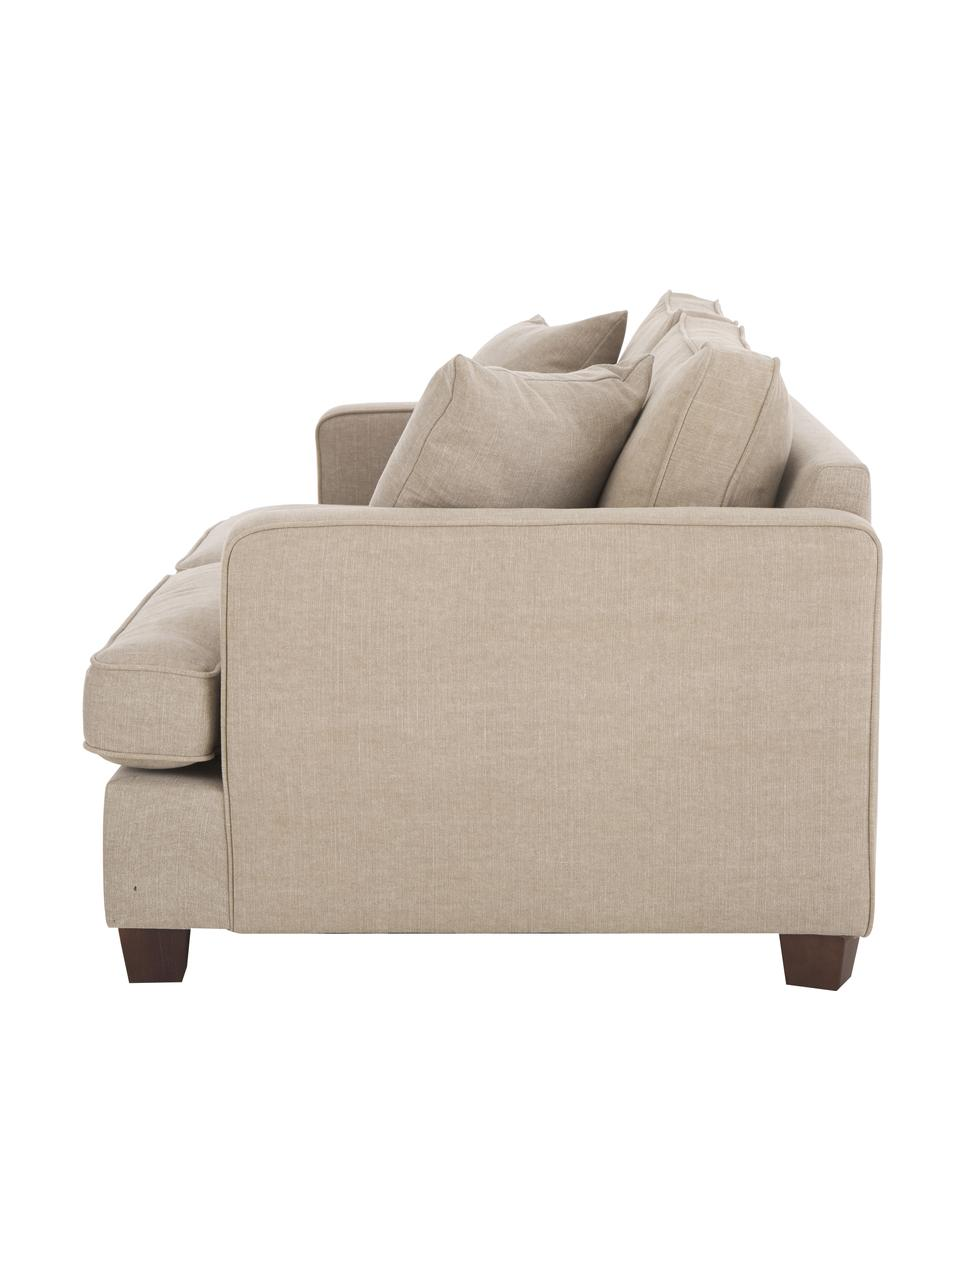 Grand canapé 2places beige Warren, Tissu beige